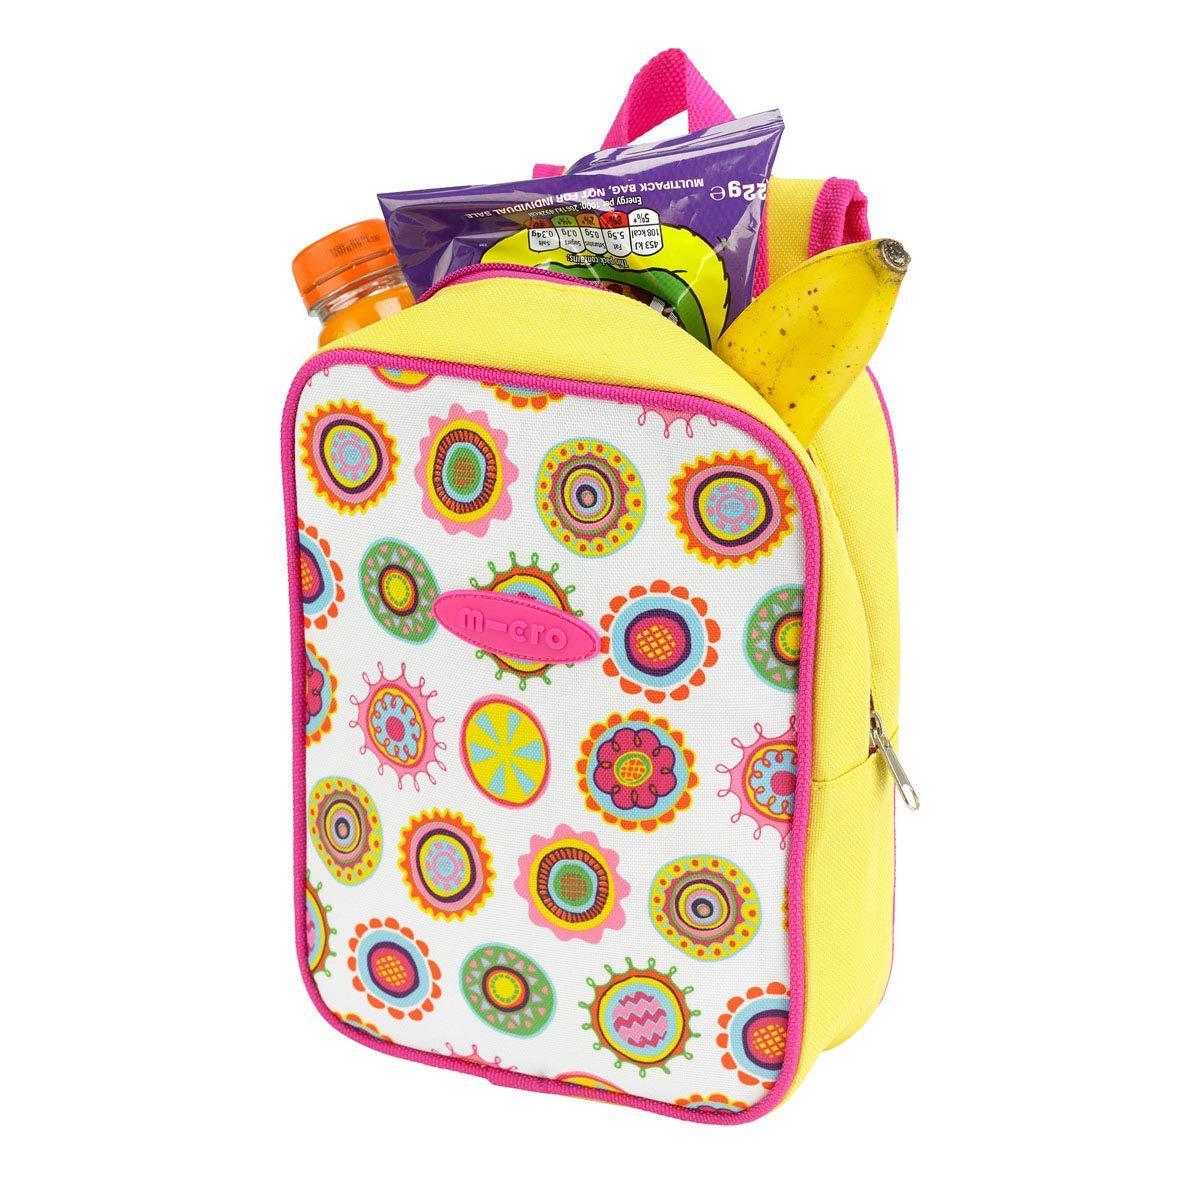 Micro Lunch Bag Doodle Spot Print Picnic Rucksack Bag Cool Bag Girls Childrens